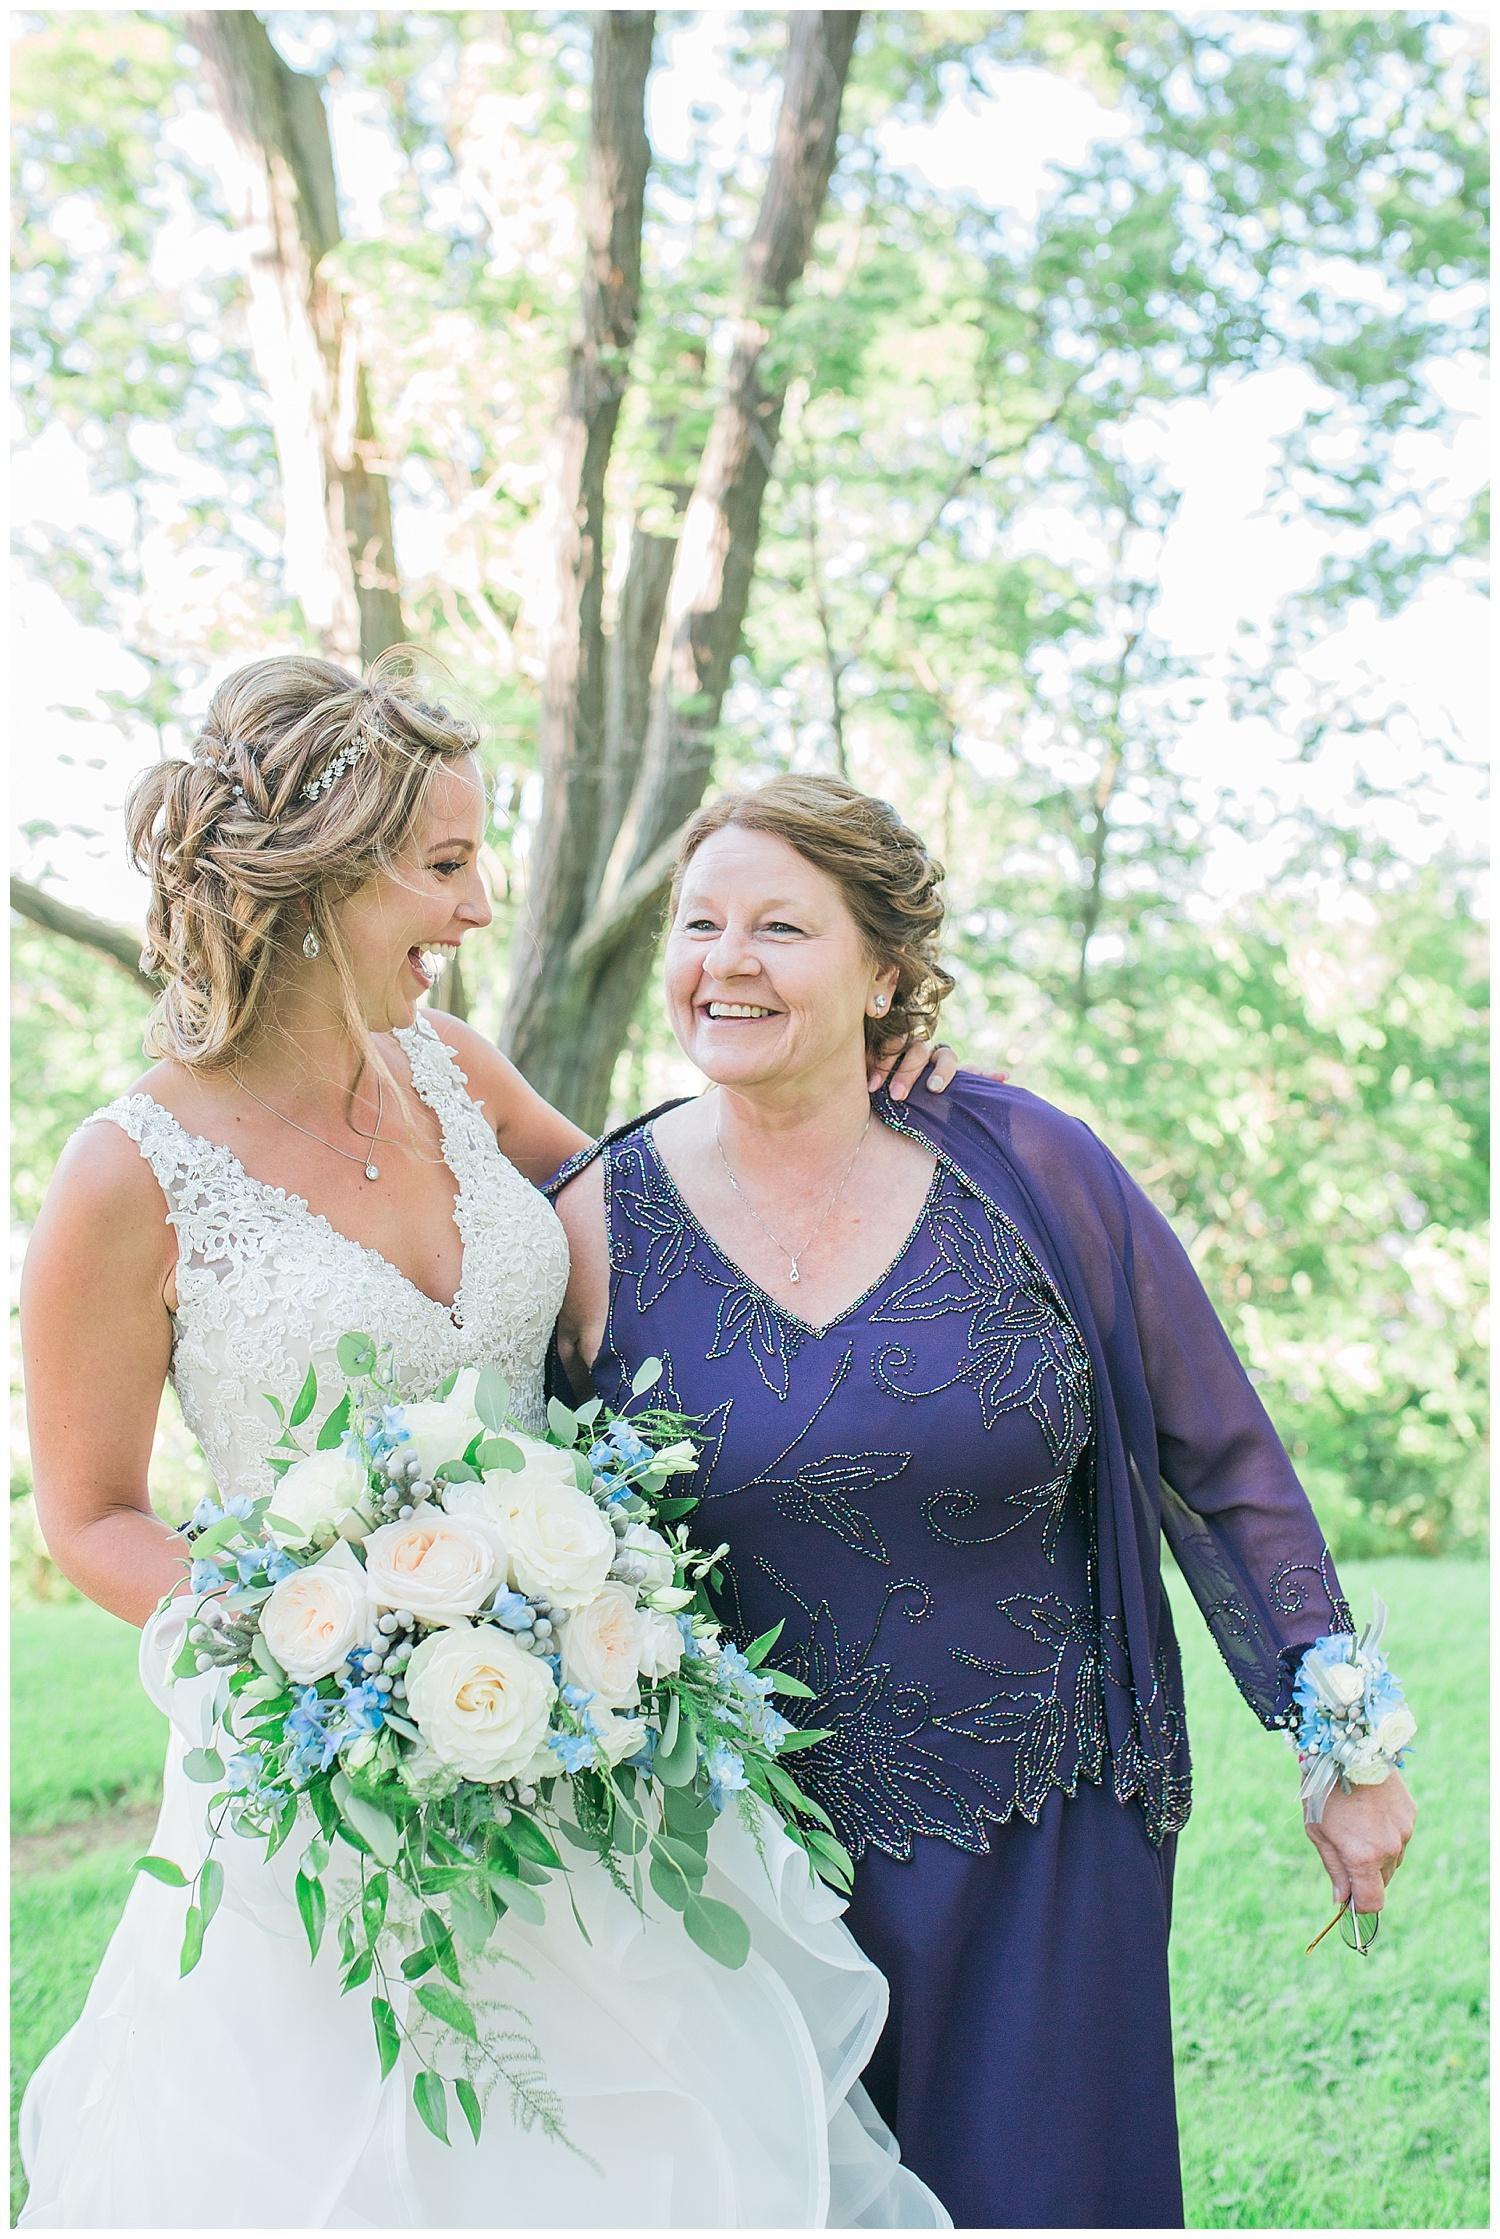 Sean and Andrea - Webster wedding - lass and beau-837_Buffalo wedding photography.jpg